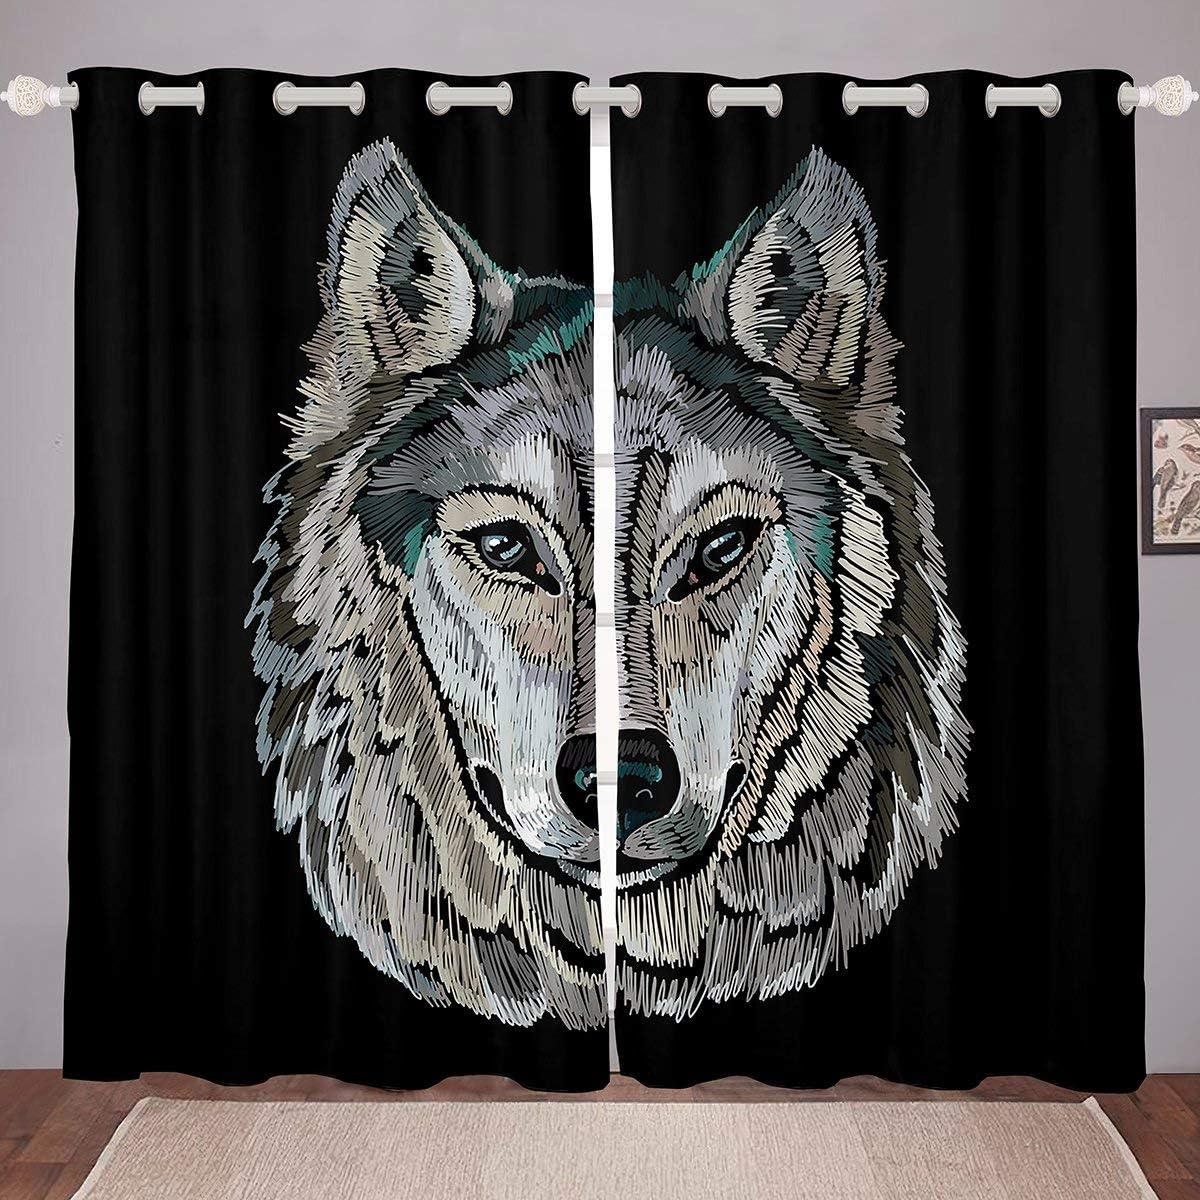 "Erosebridal Wolf Window Drapes Cartoon Wolf Head Curtains African Savannah Wildlife Animal Window Curtain Panels Boho Hippie Embroidery Style Grommet Curtain, Fashion Decor 104"" X 96"",Black"